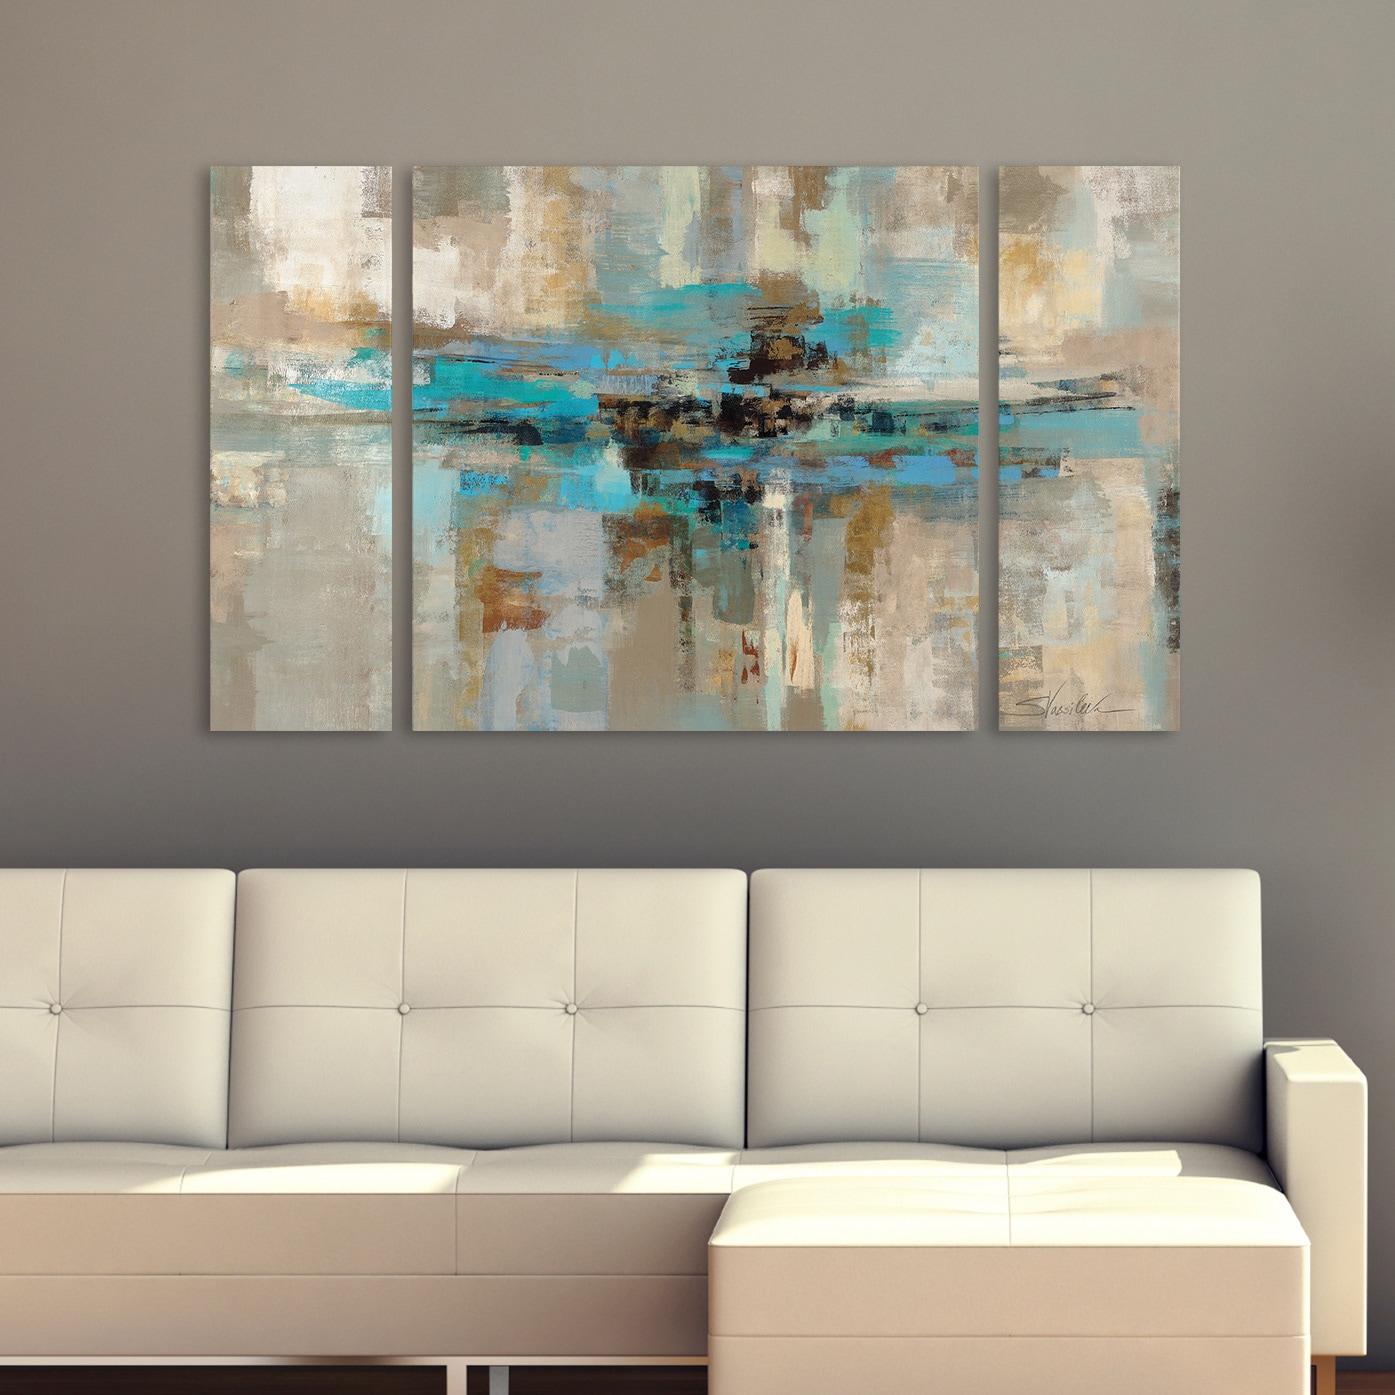 3 Piece Canvas Panel Set Wall Art Modern Contemporary Abstract